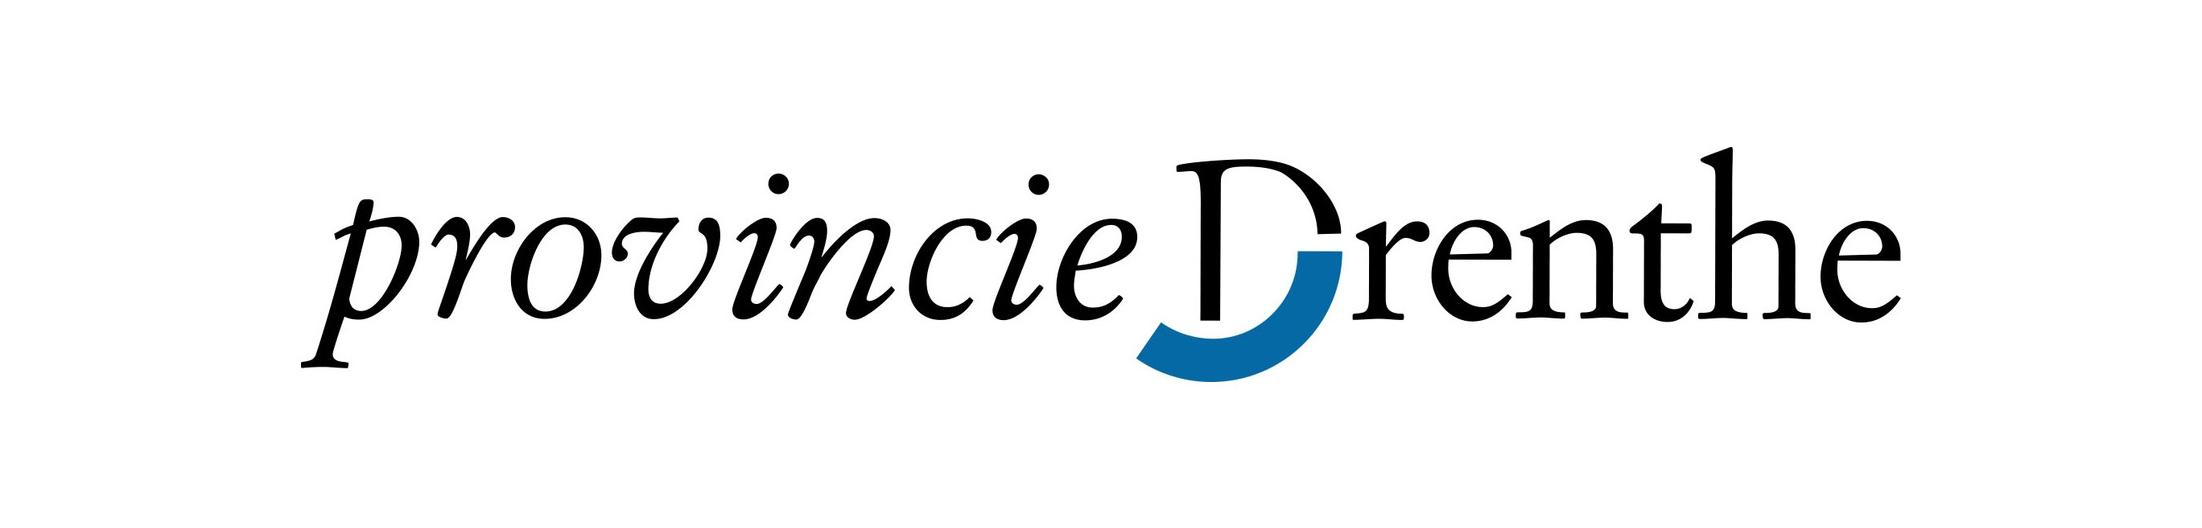 provincie_drenthe